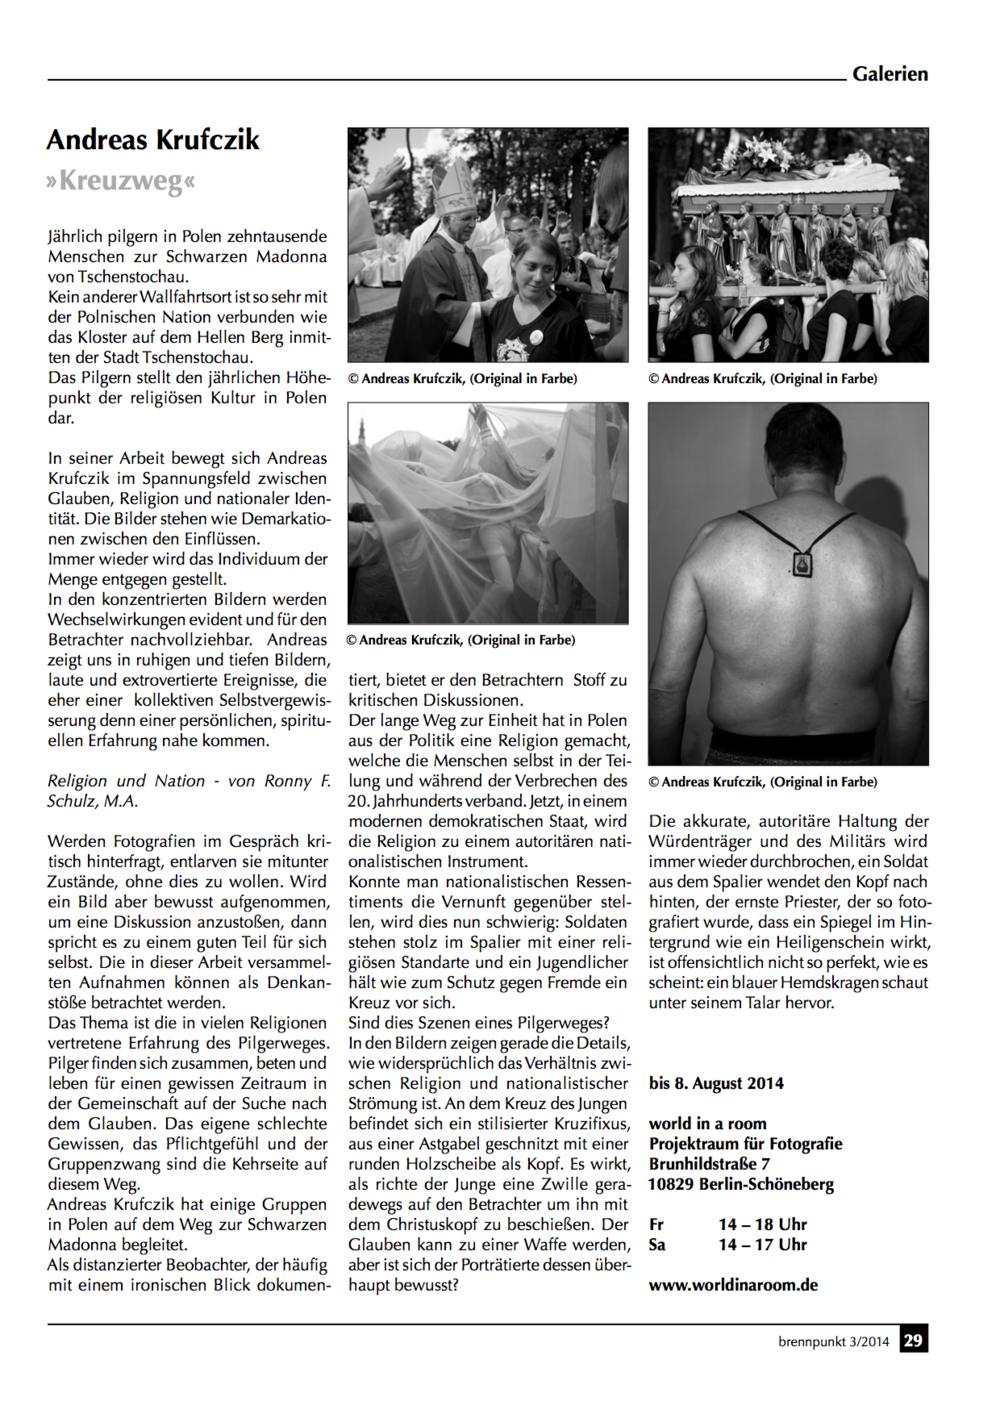 Brennpunkt 3/2014 Artikel- Kreuzweg